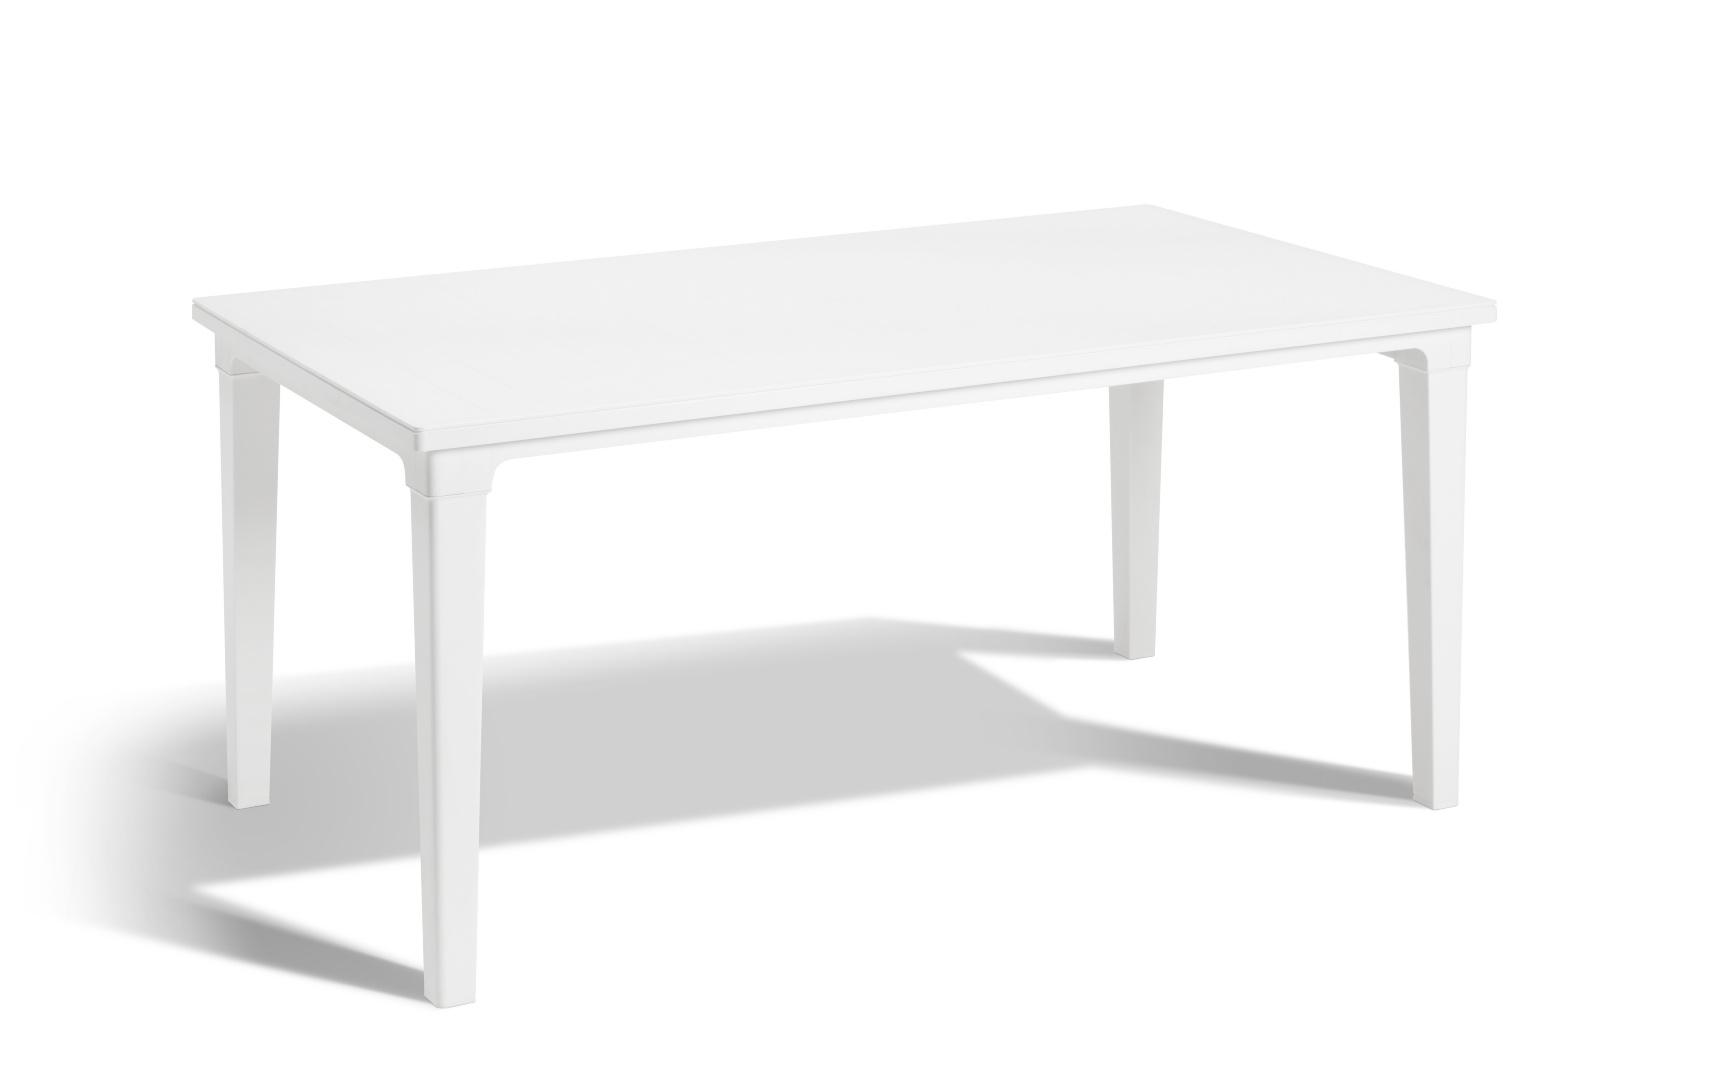 Grande Table De Jardin Plastique Blanc | 1 Table De Camping Jardin ...